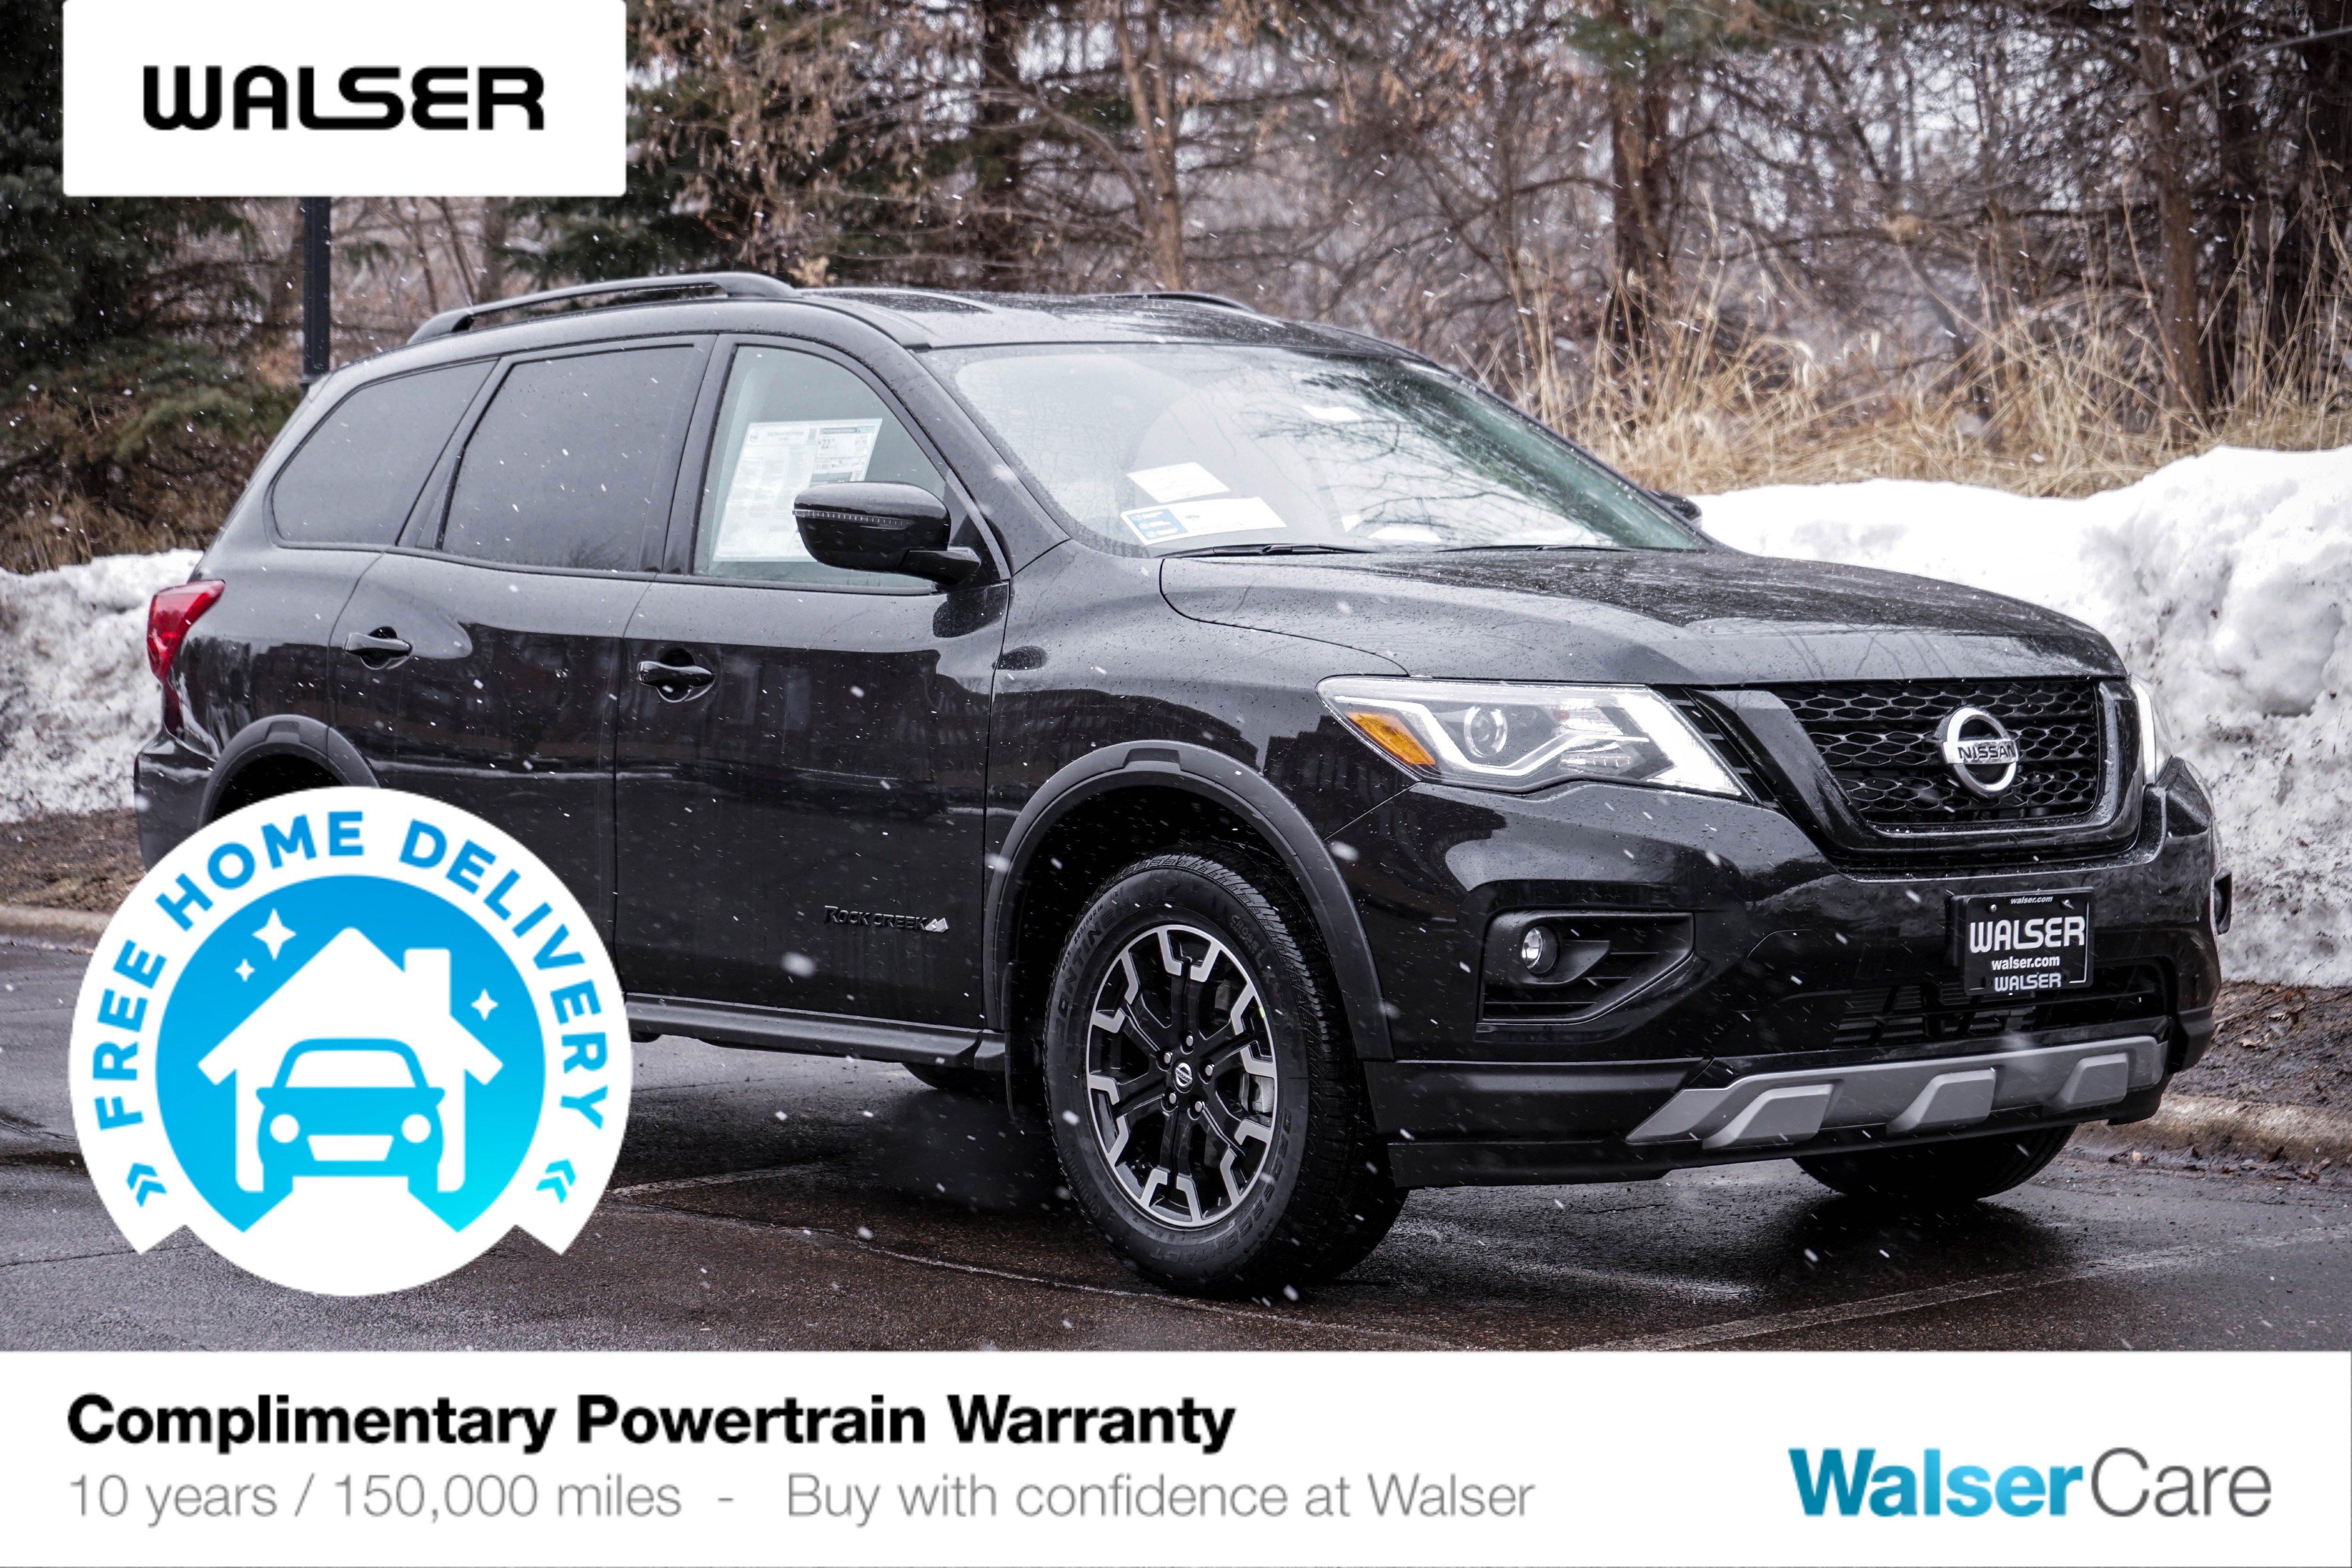 New 2020 Nissan Pathfinder SV 4WD TECHNOLOGY